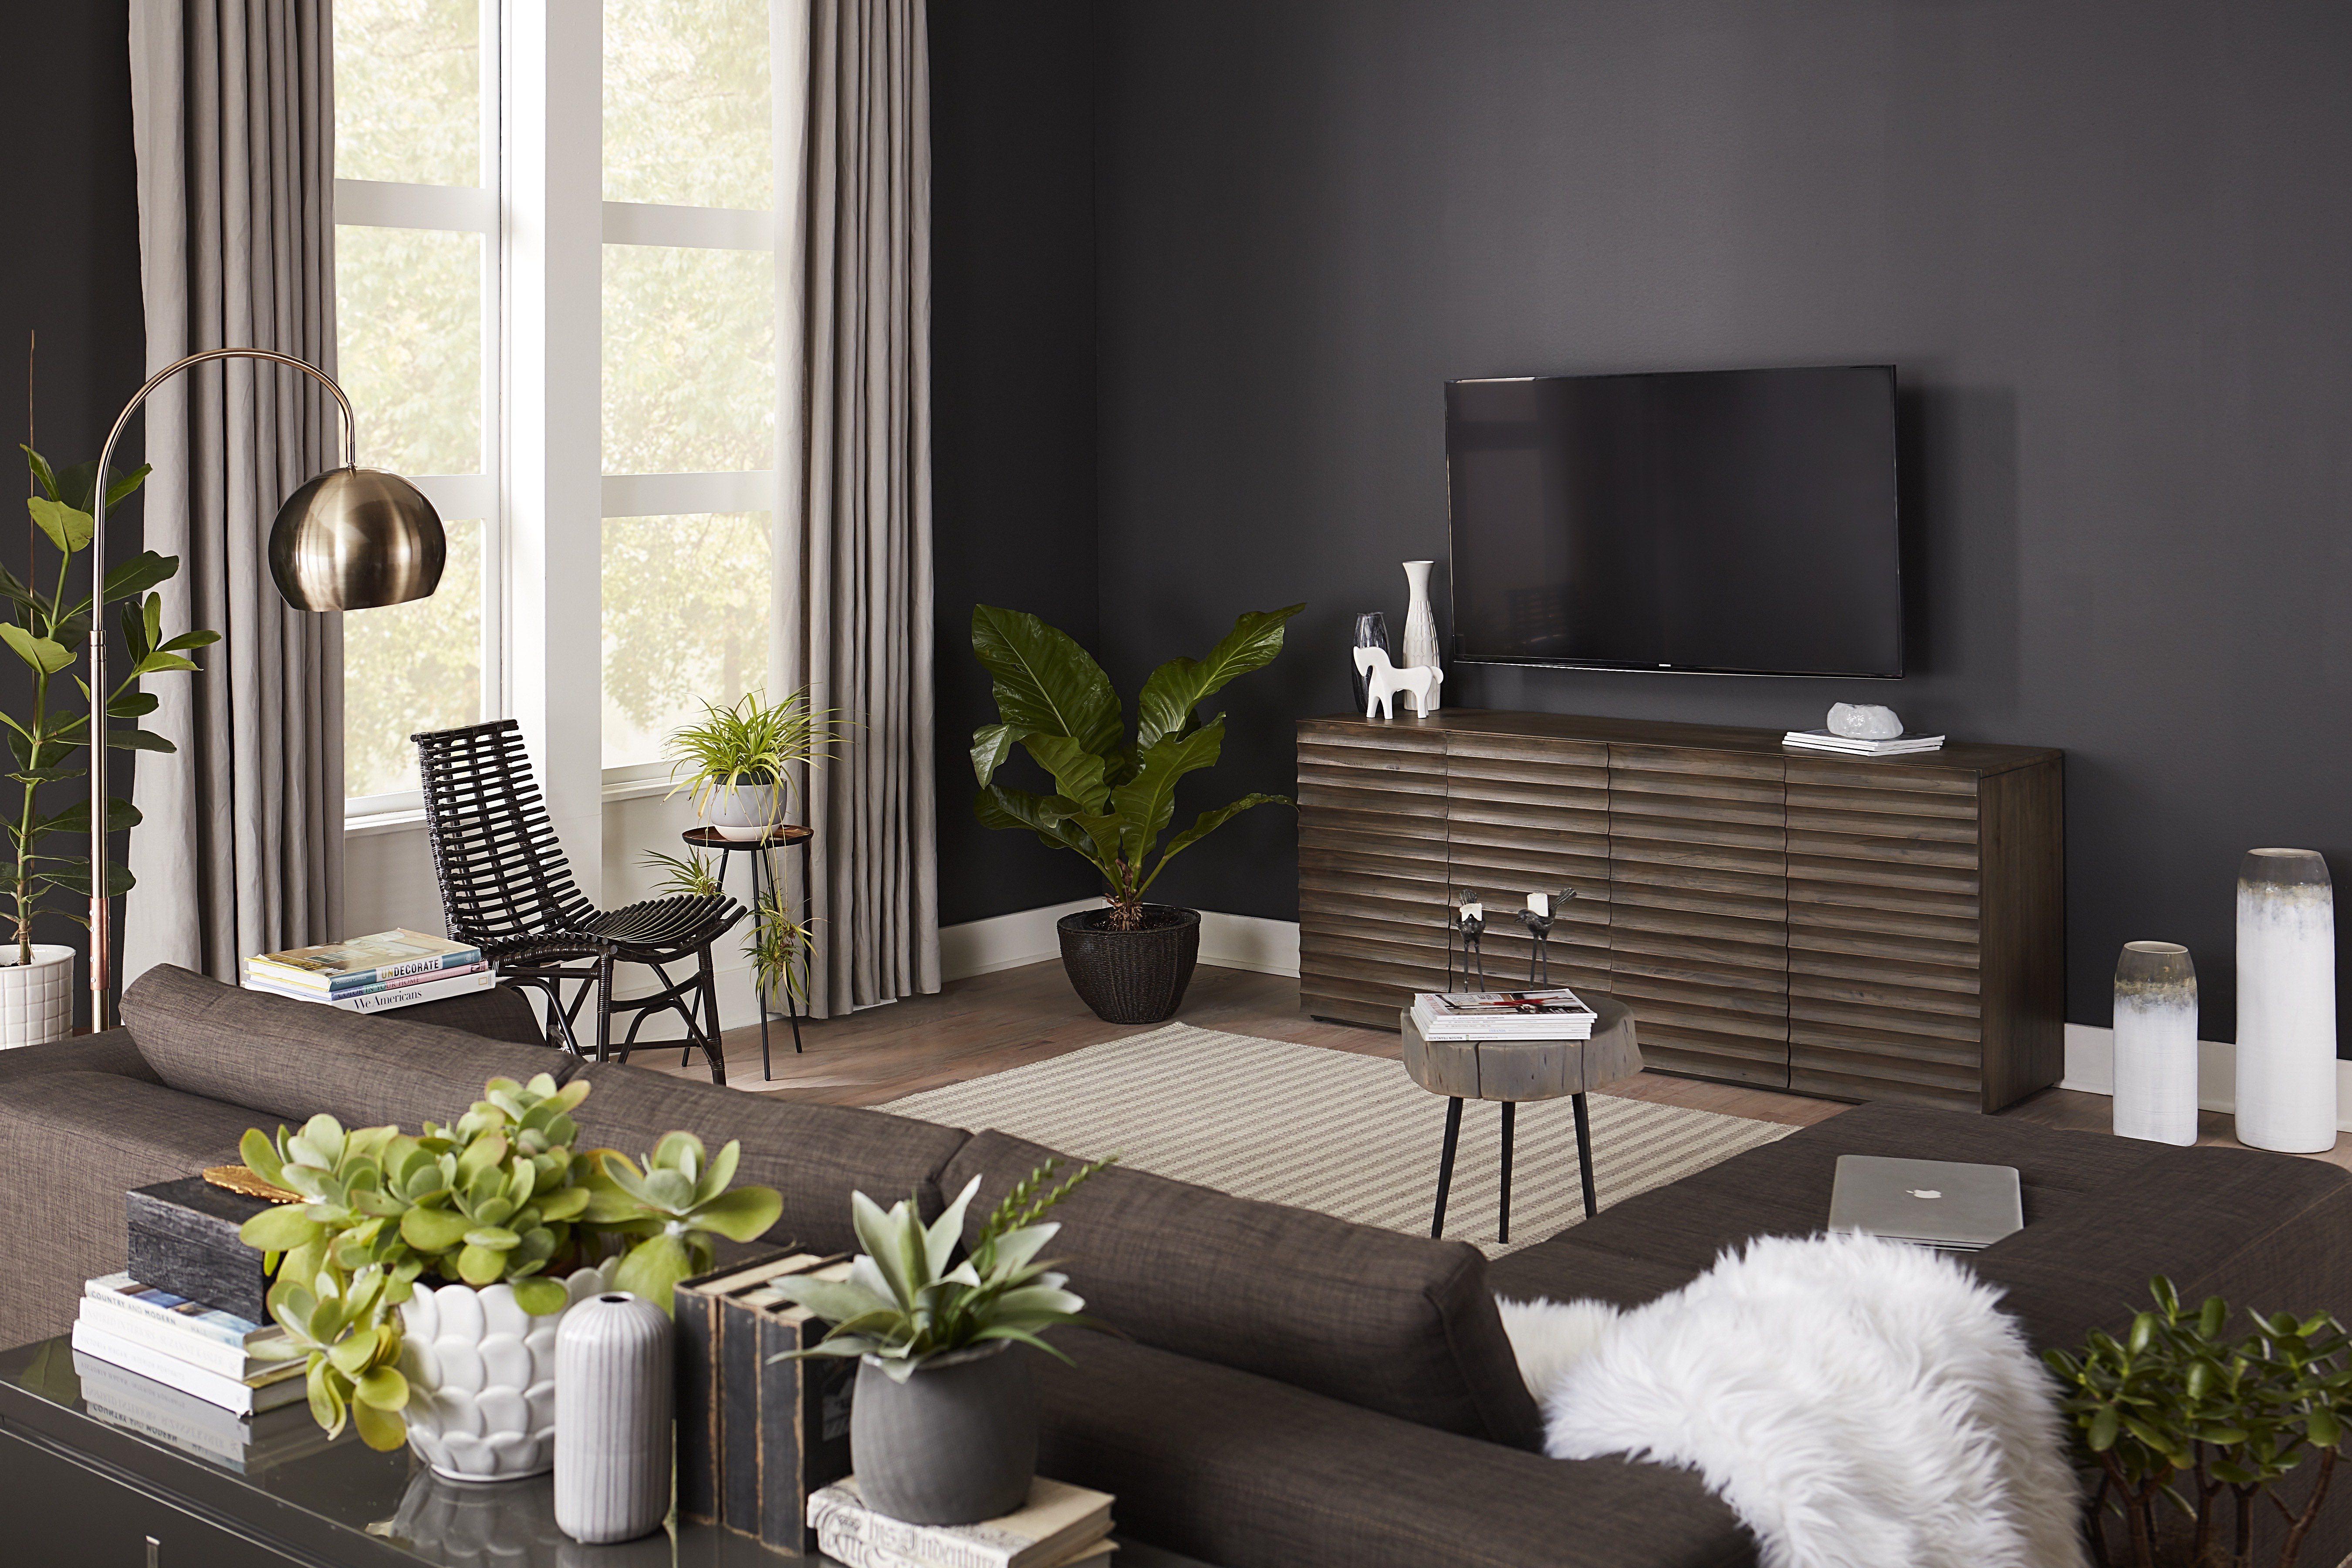 dark TV accent wall